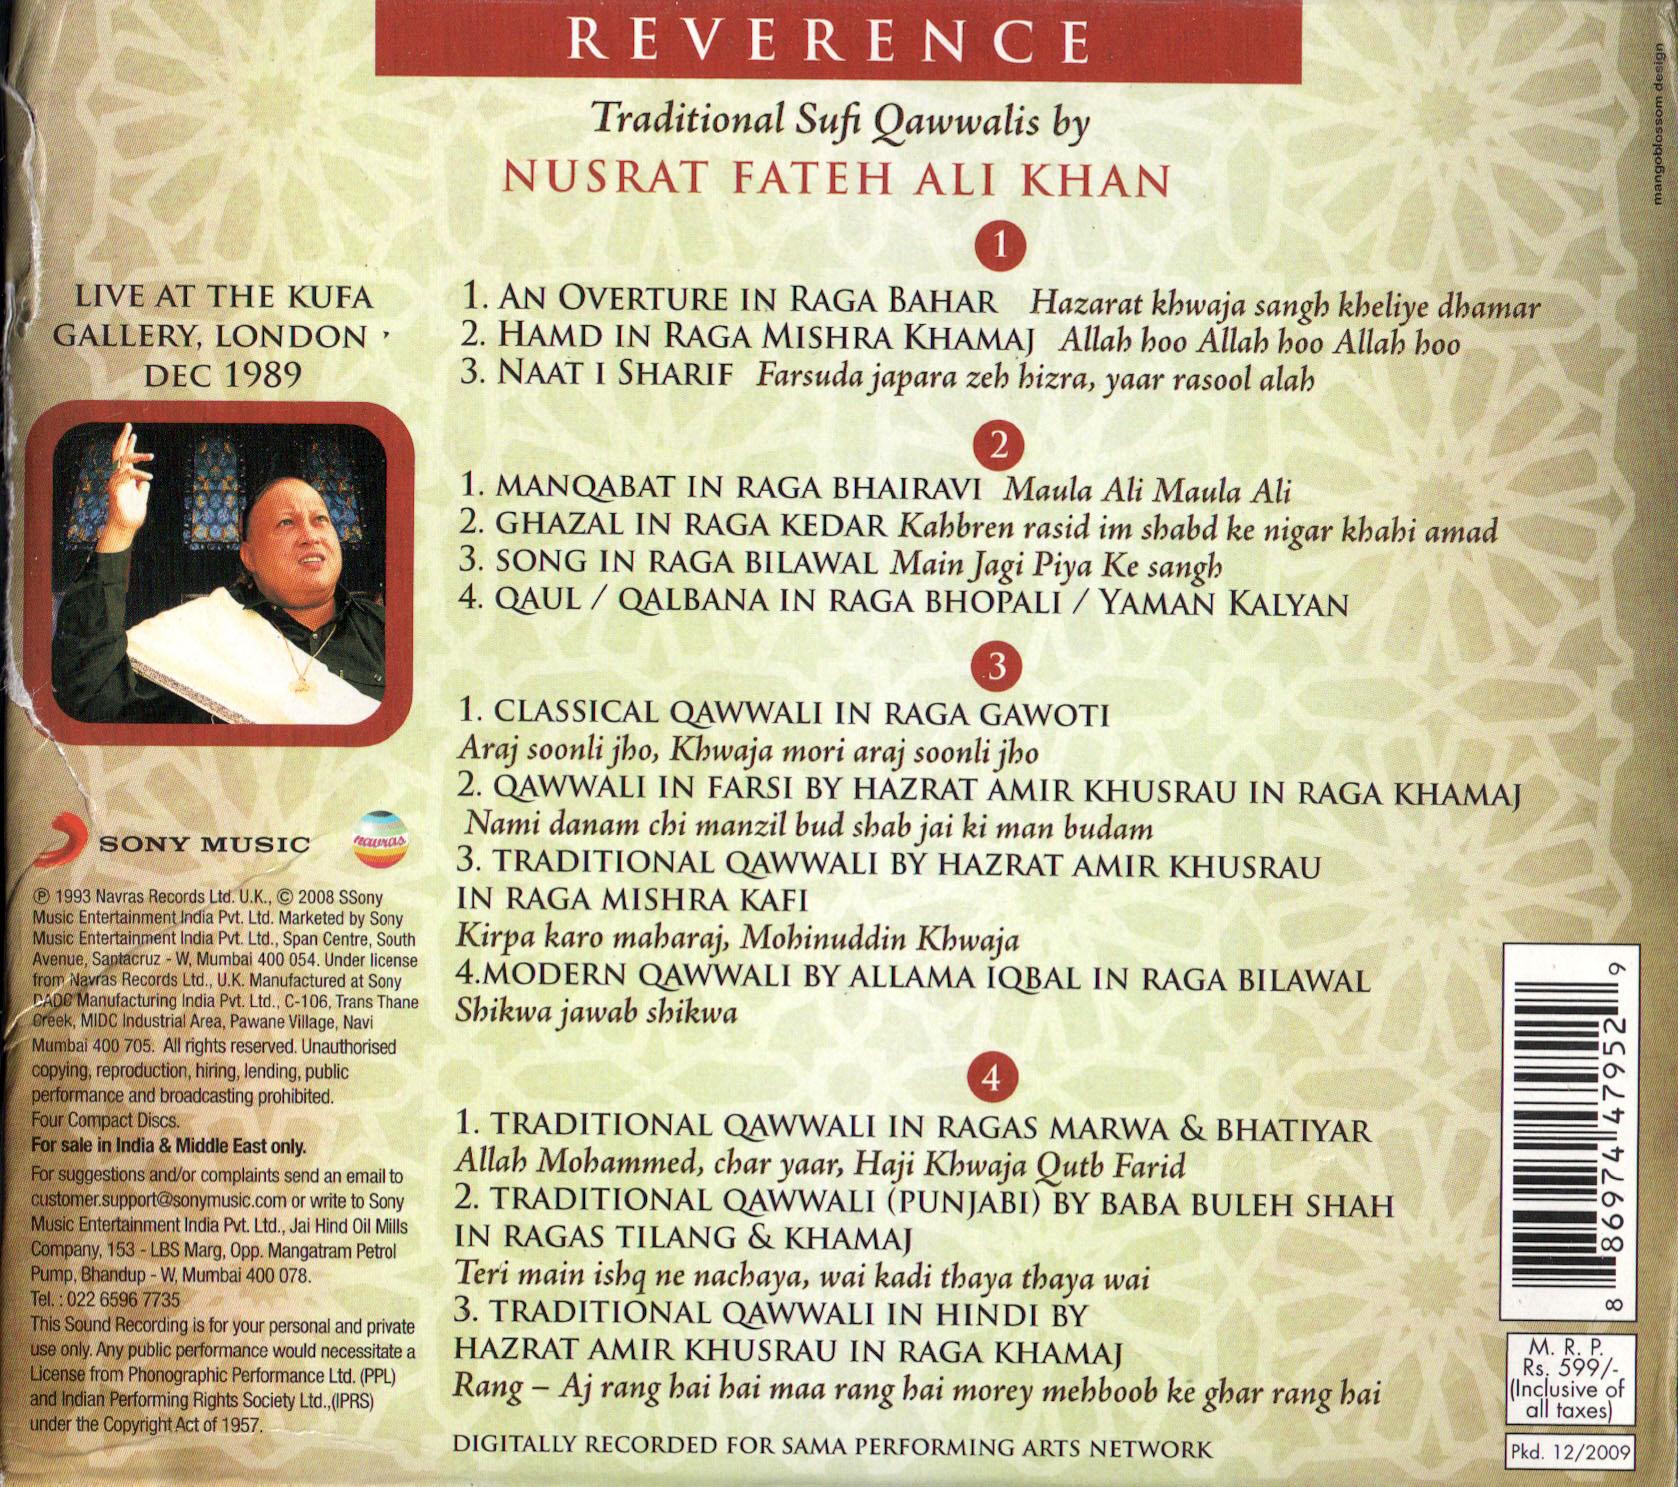 Nusrat Fateh Ali Khan - Reverence: Traditional Sufi Qawwalis